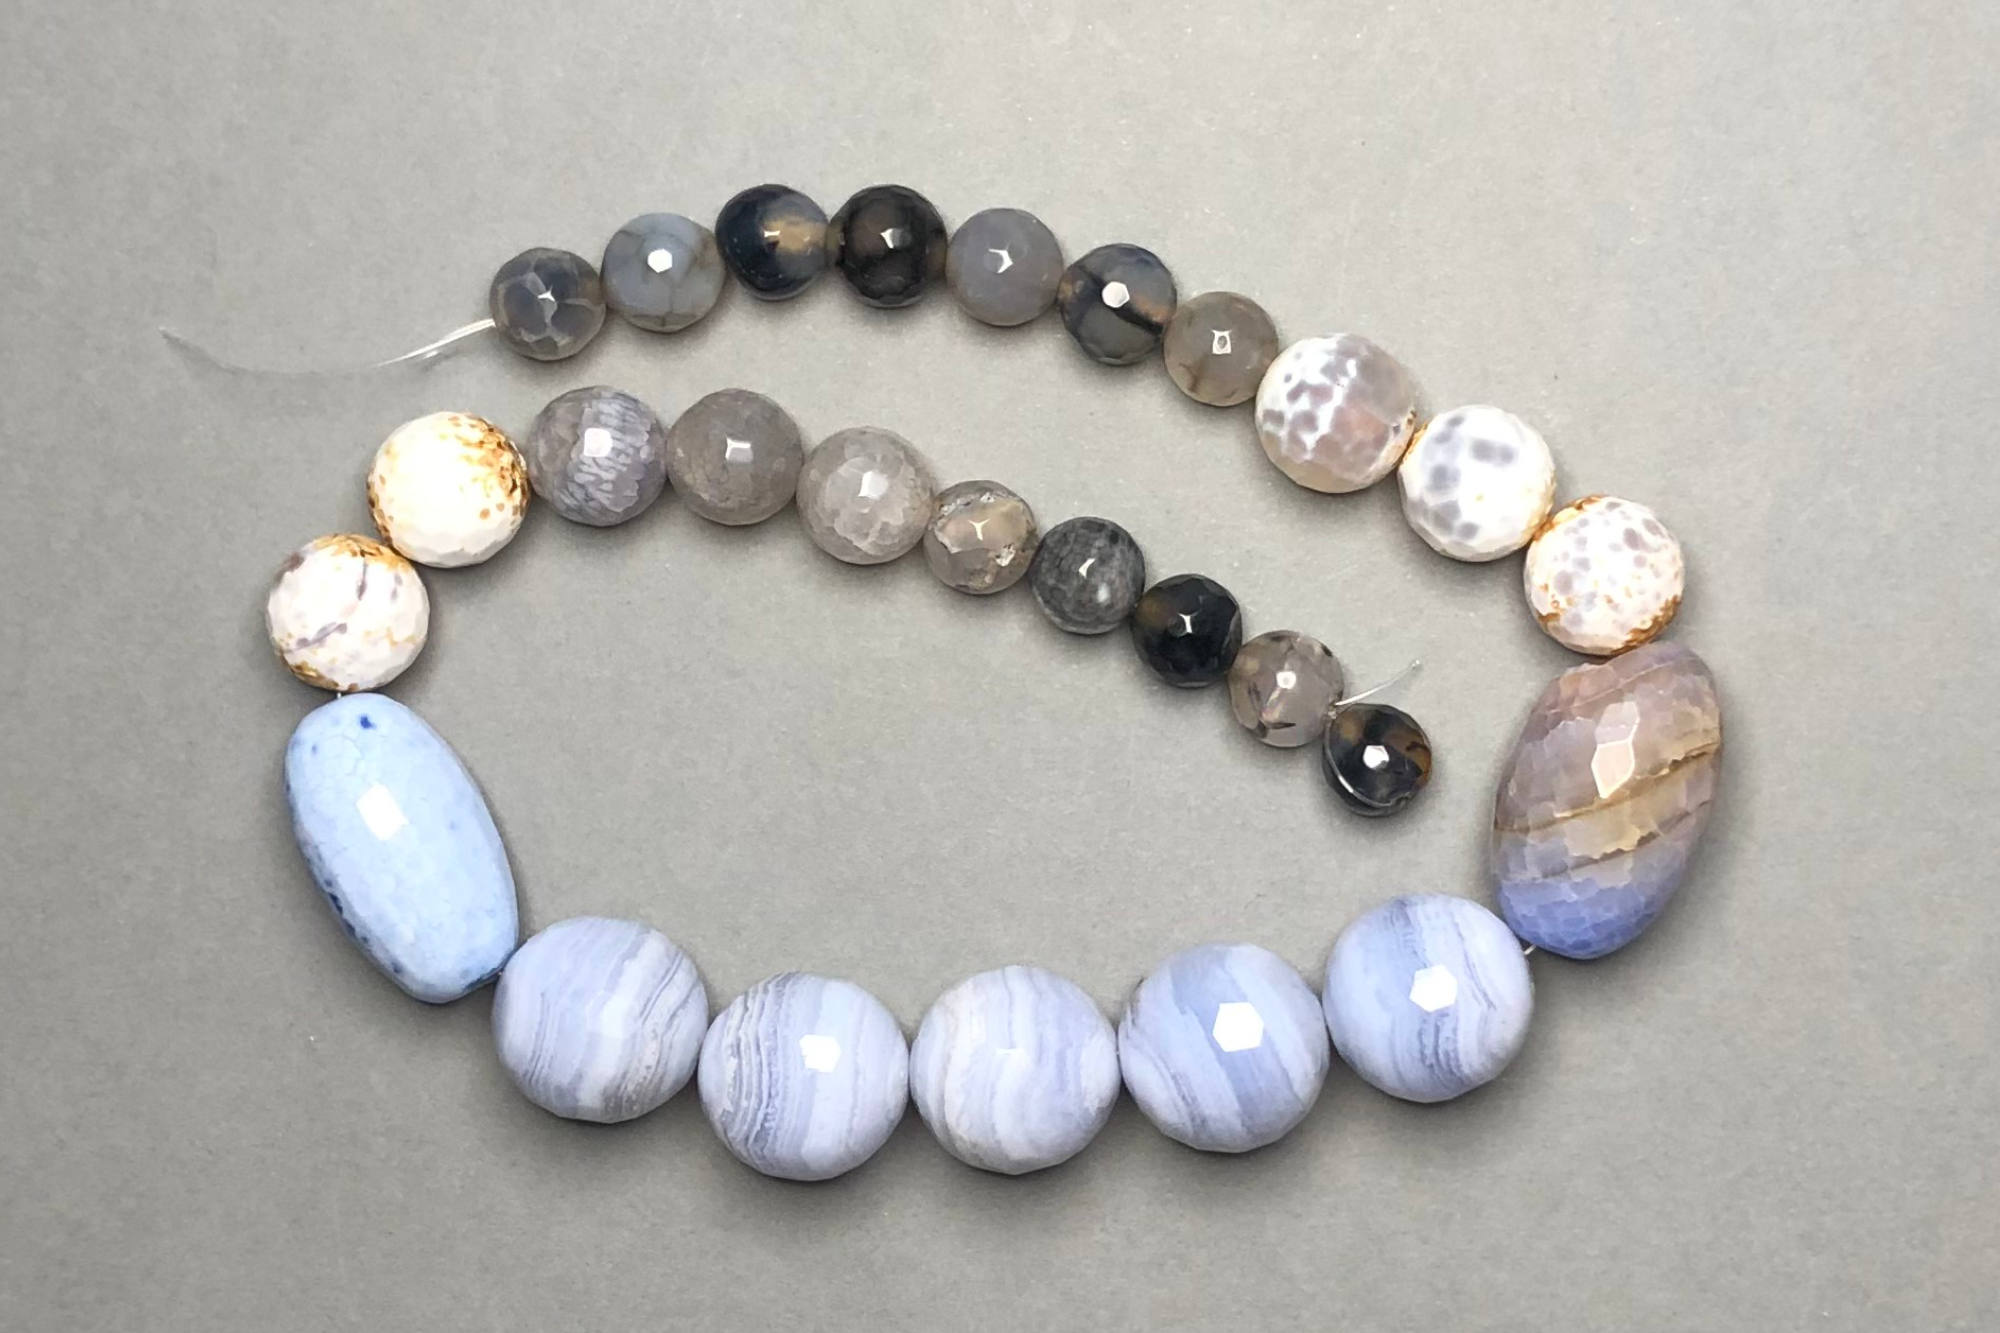 Blue/Grey Agate 37cm Strand, Assorted